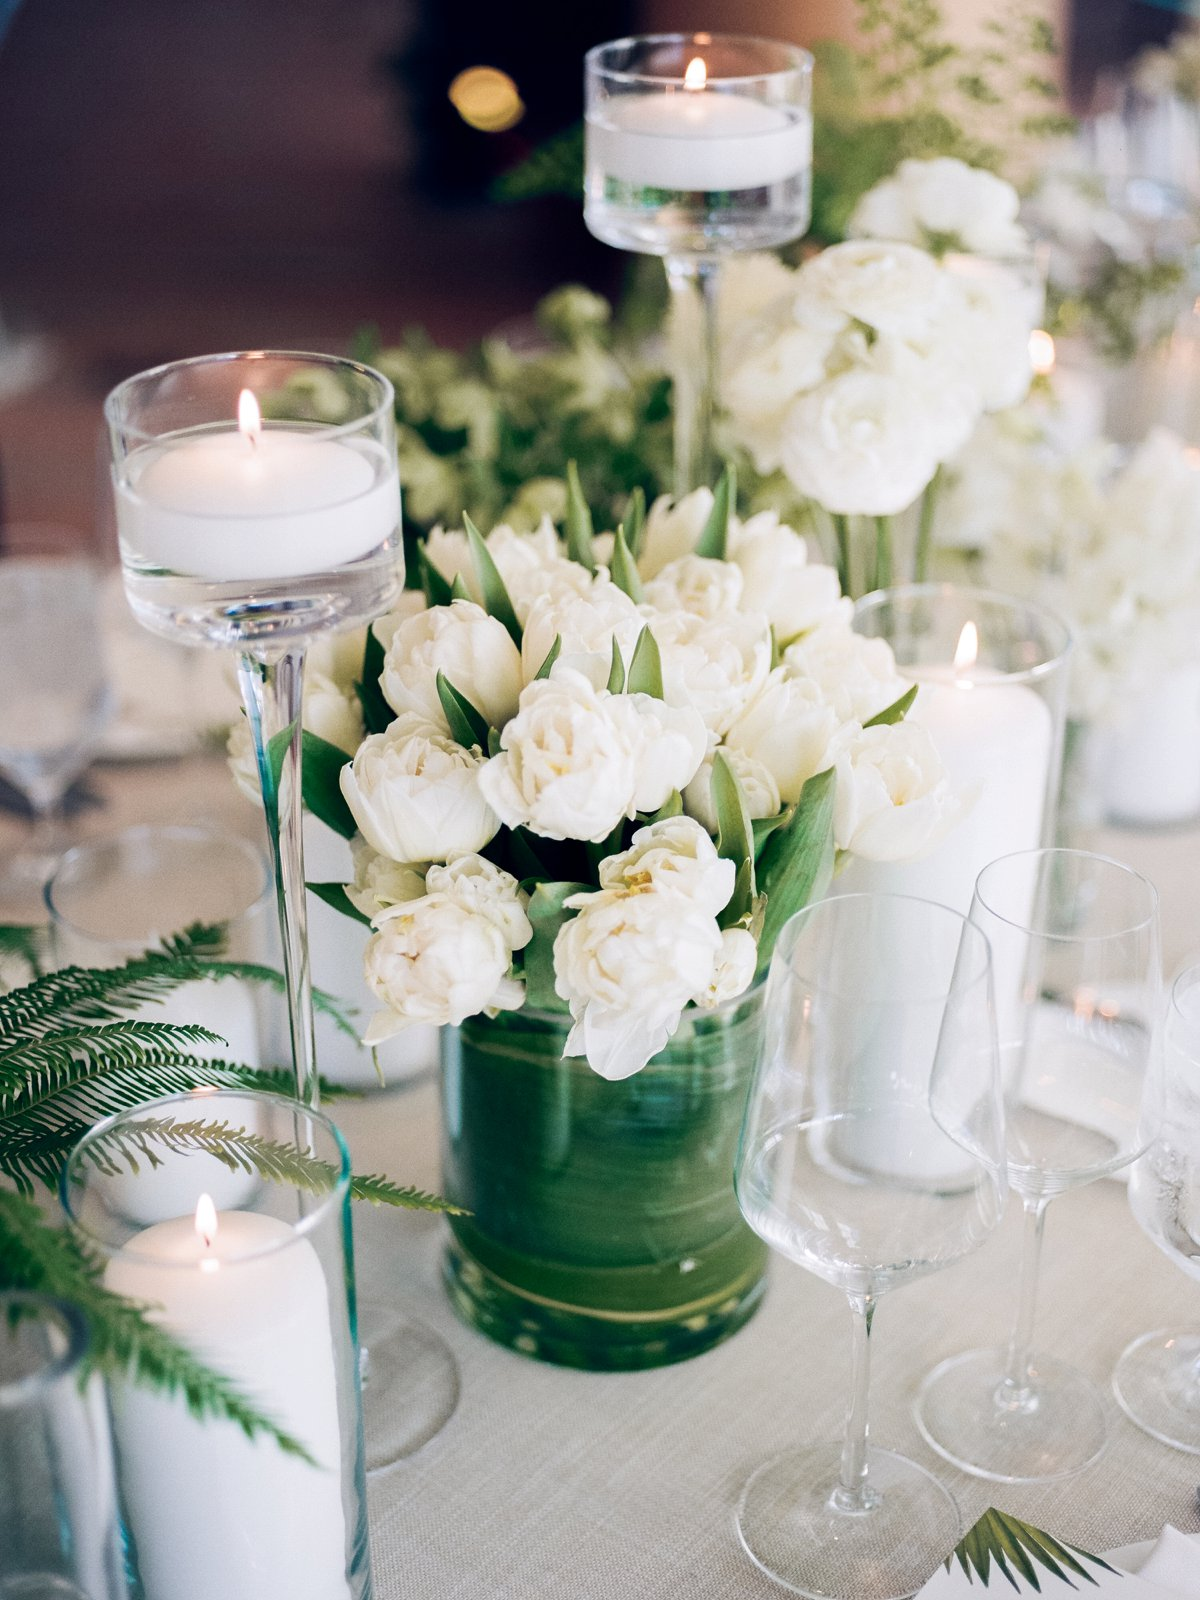 green and white wedding ideas - photo by Anna Delores http://ruffledblog.com/chic-modern-wedding-at-four-seasons-santa-barbara